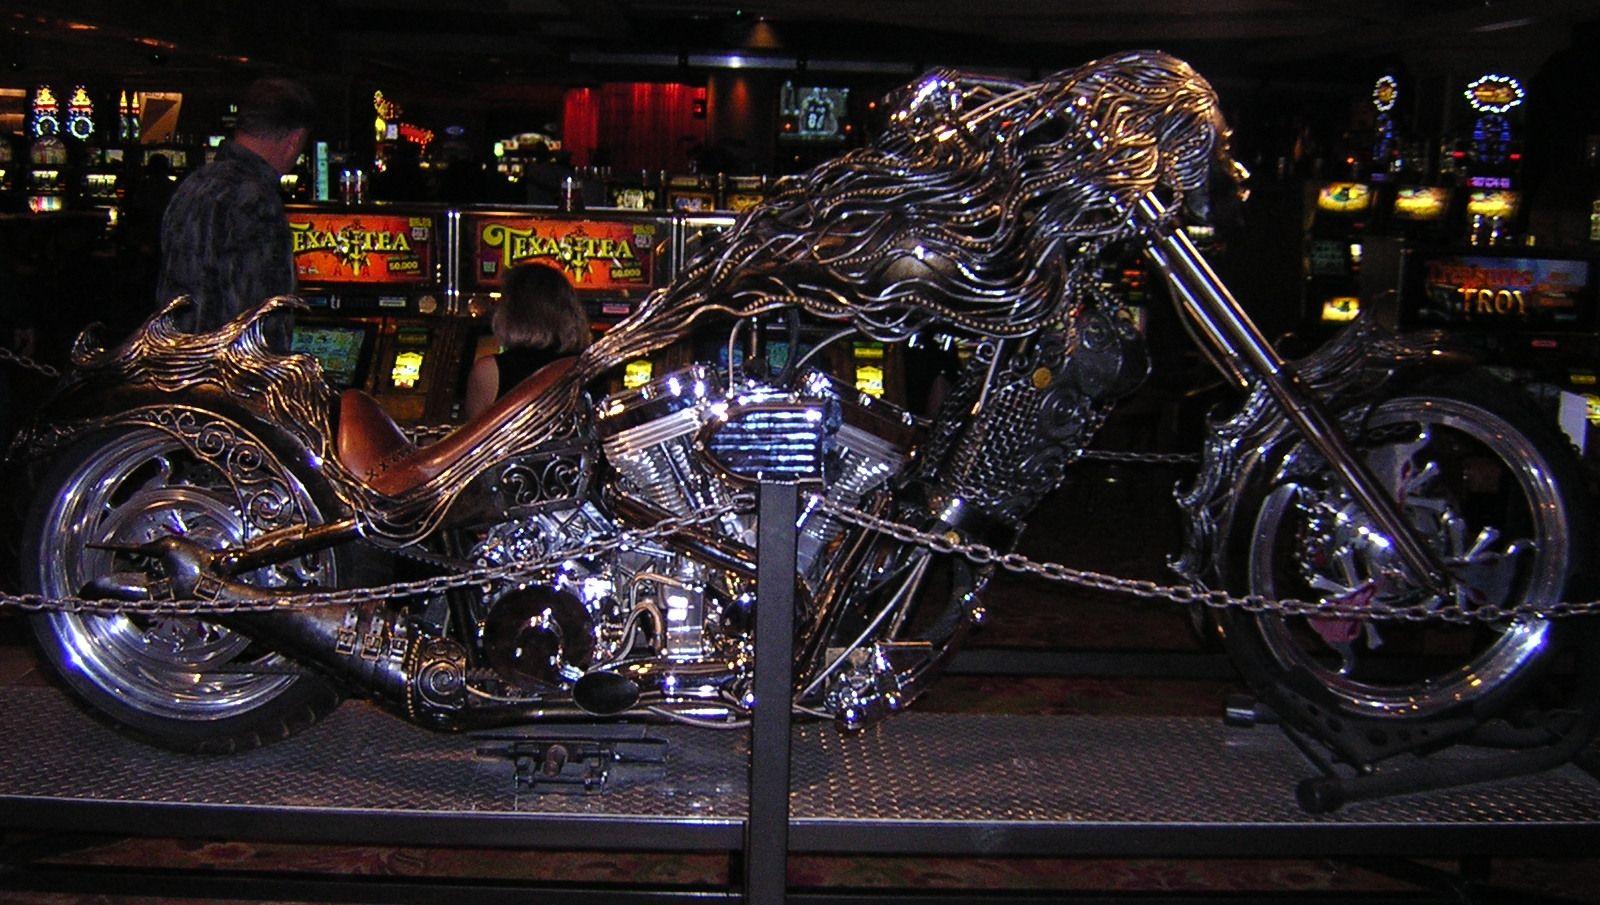 Motorcycles Ocala Florida Craigslist | Amatmotor.co